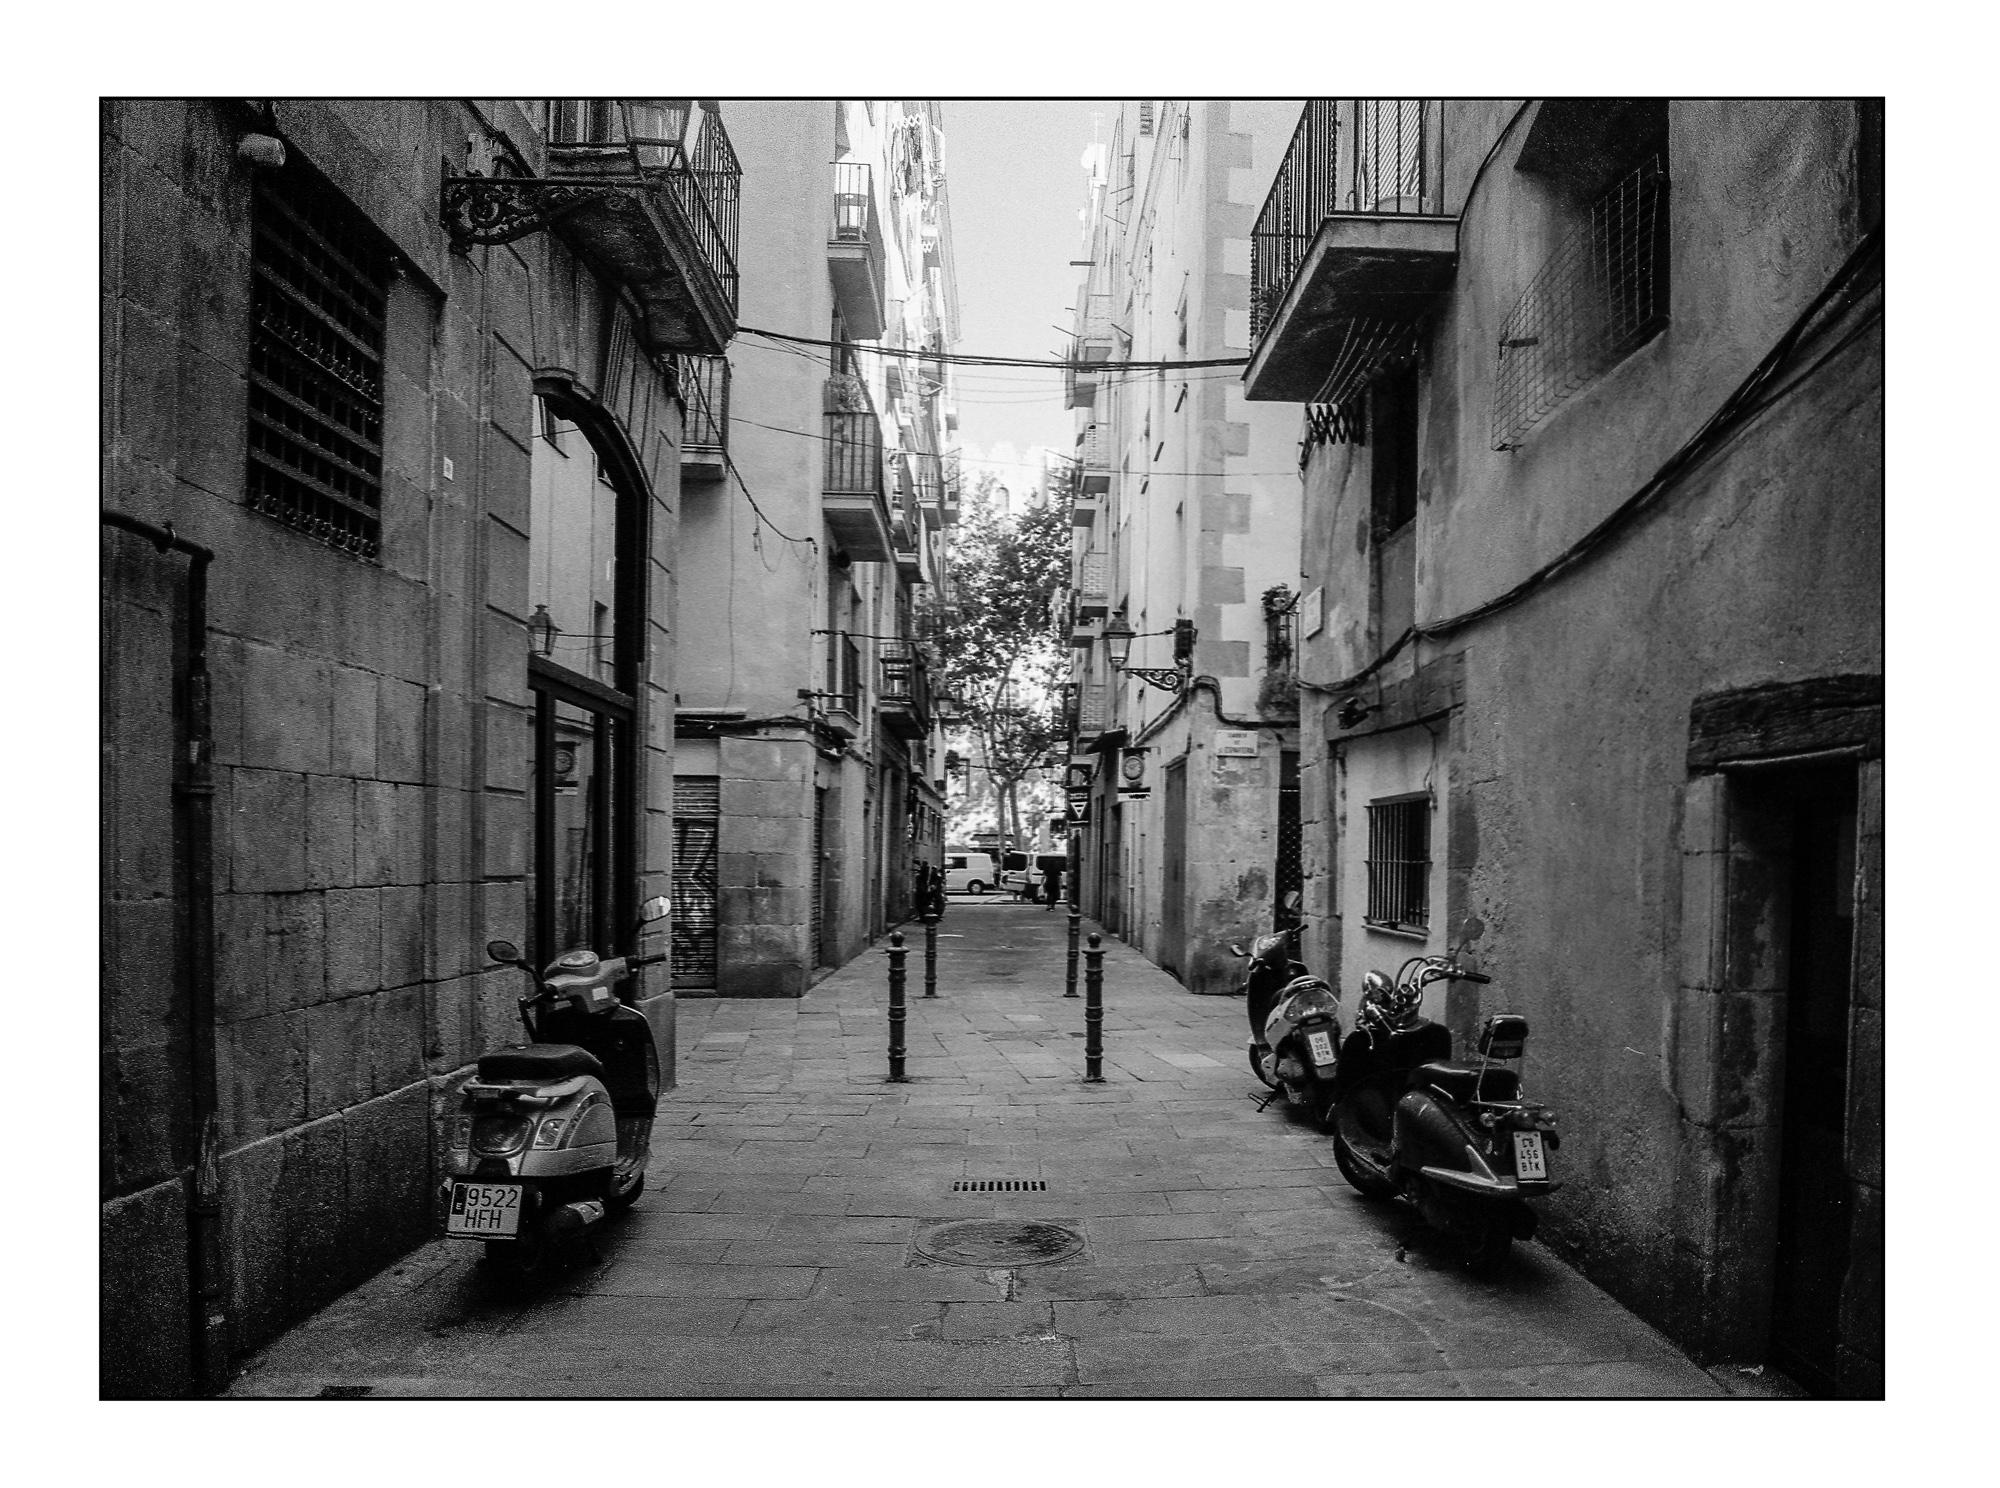 barcelona1.28-Edit-2.jpg